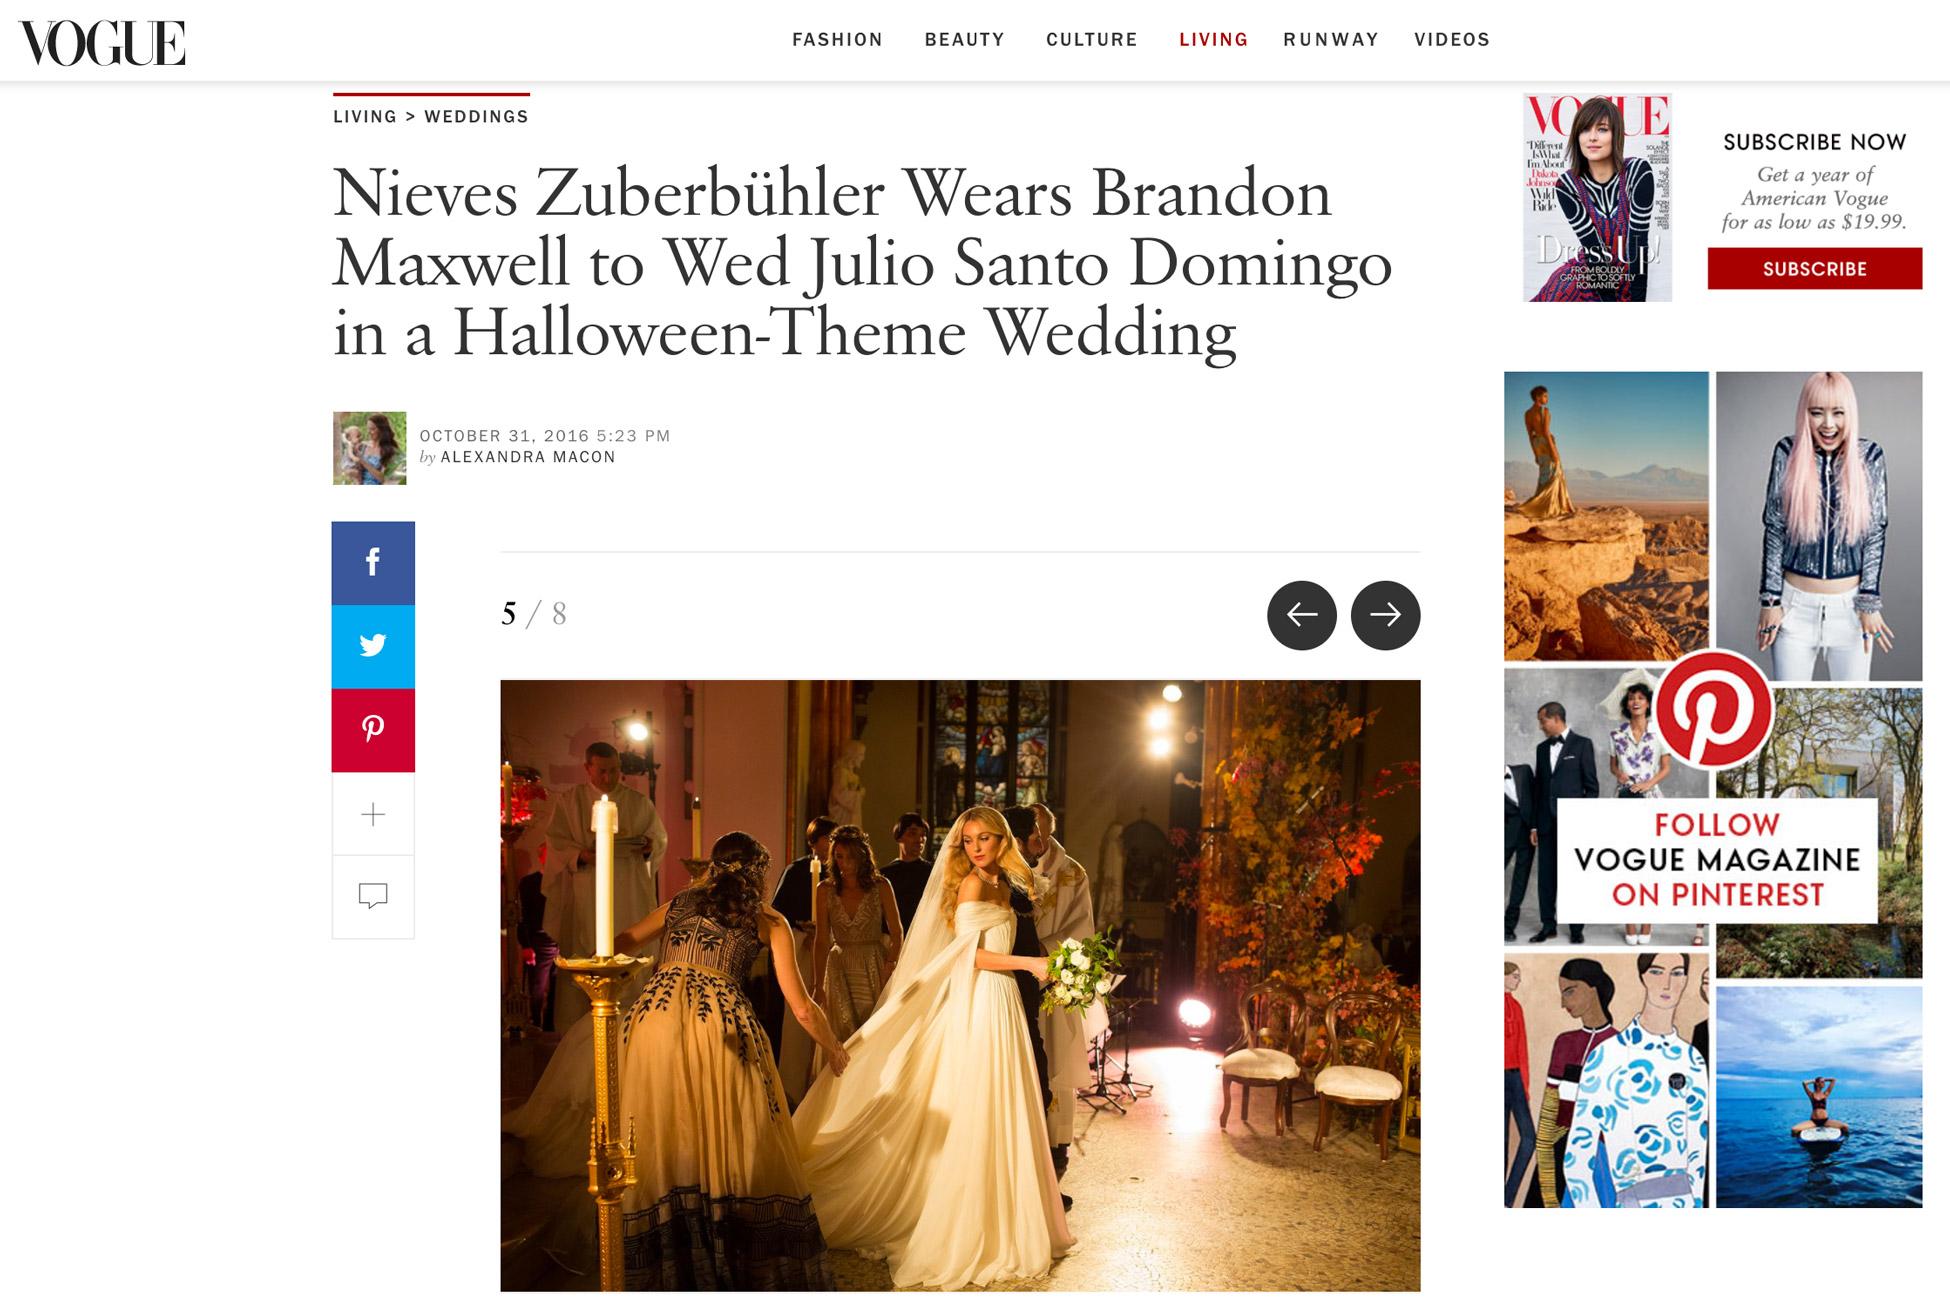 NYC Wedding Featured in Vogue